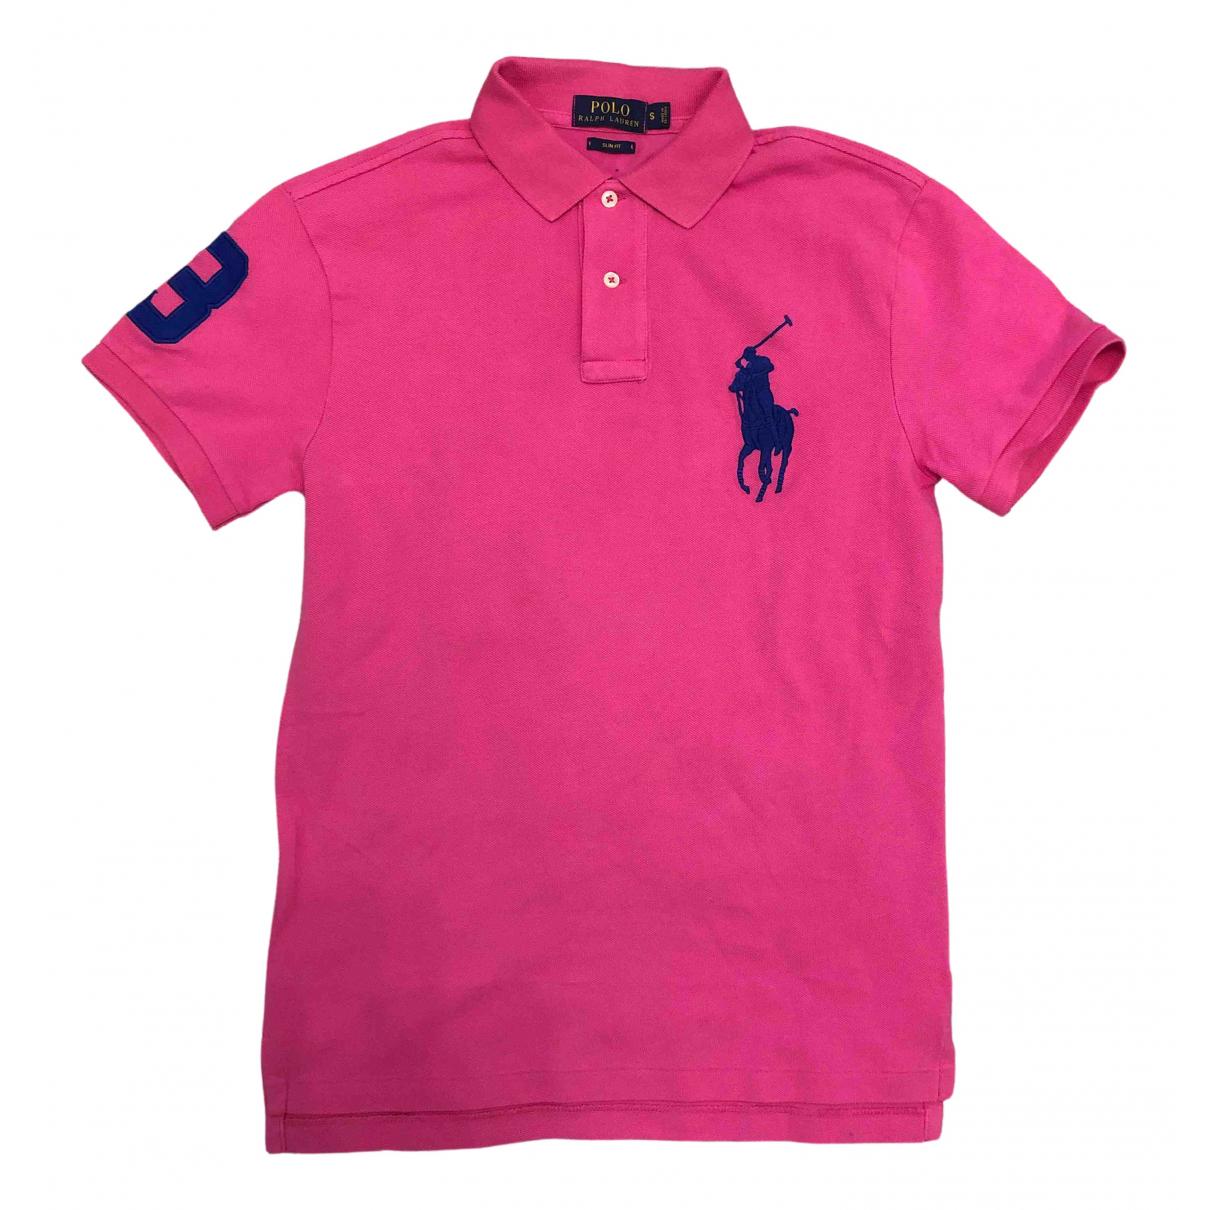 Polo Ralph Lauren - Polos   pour homme en coton - rose